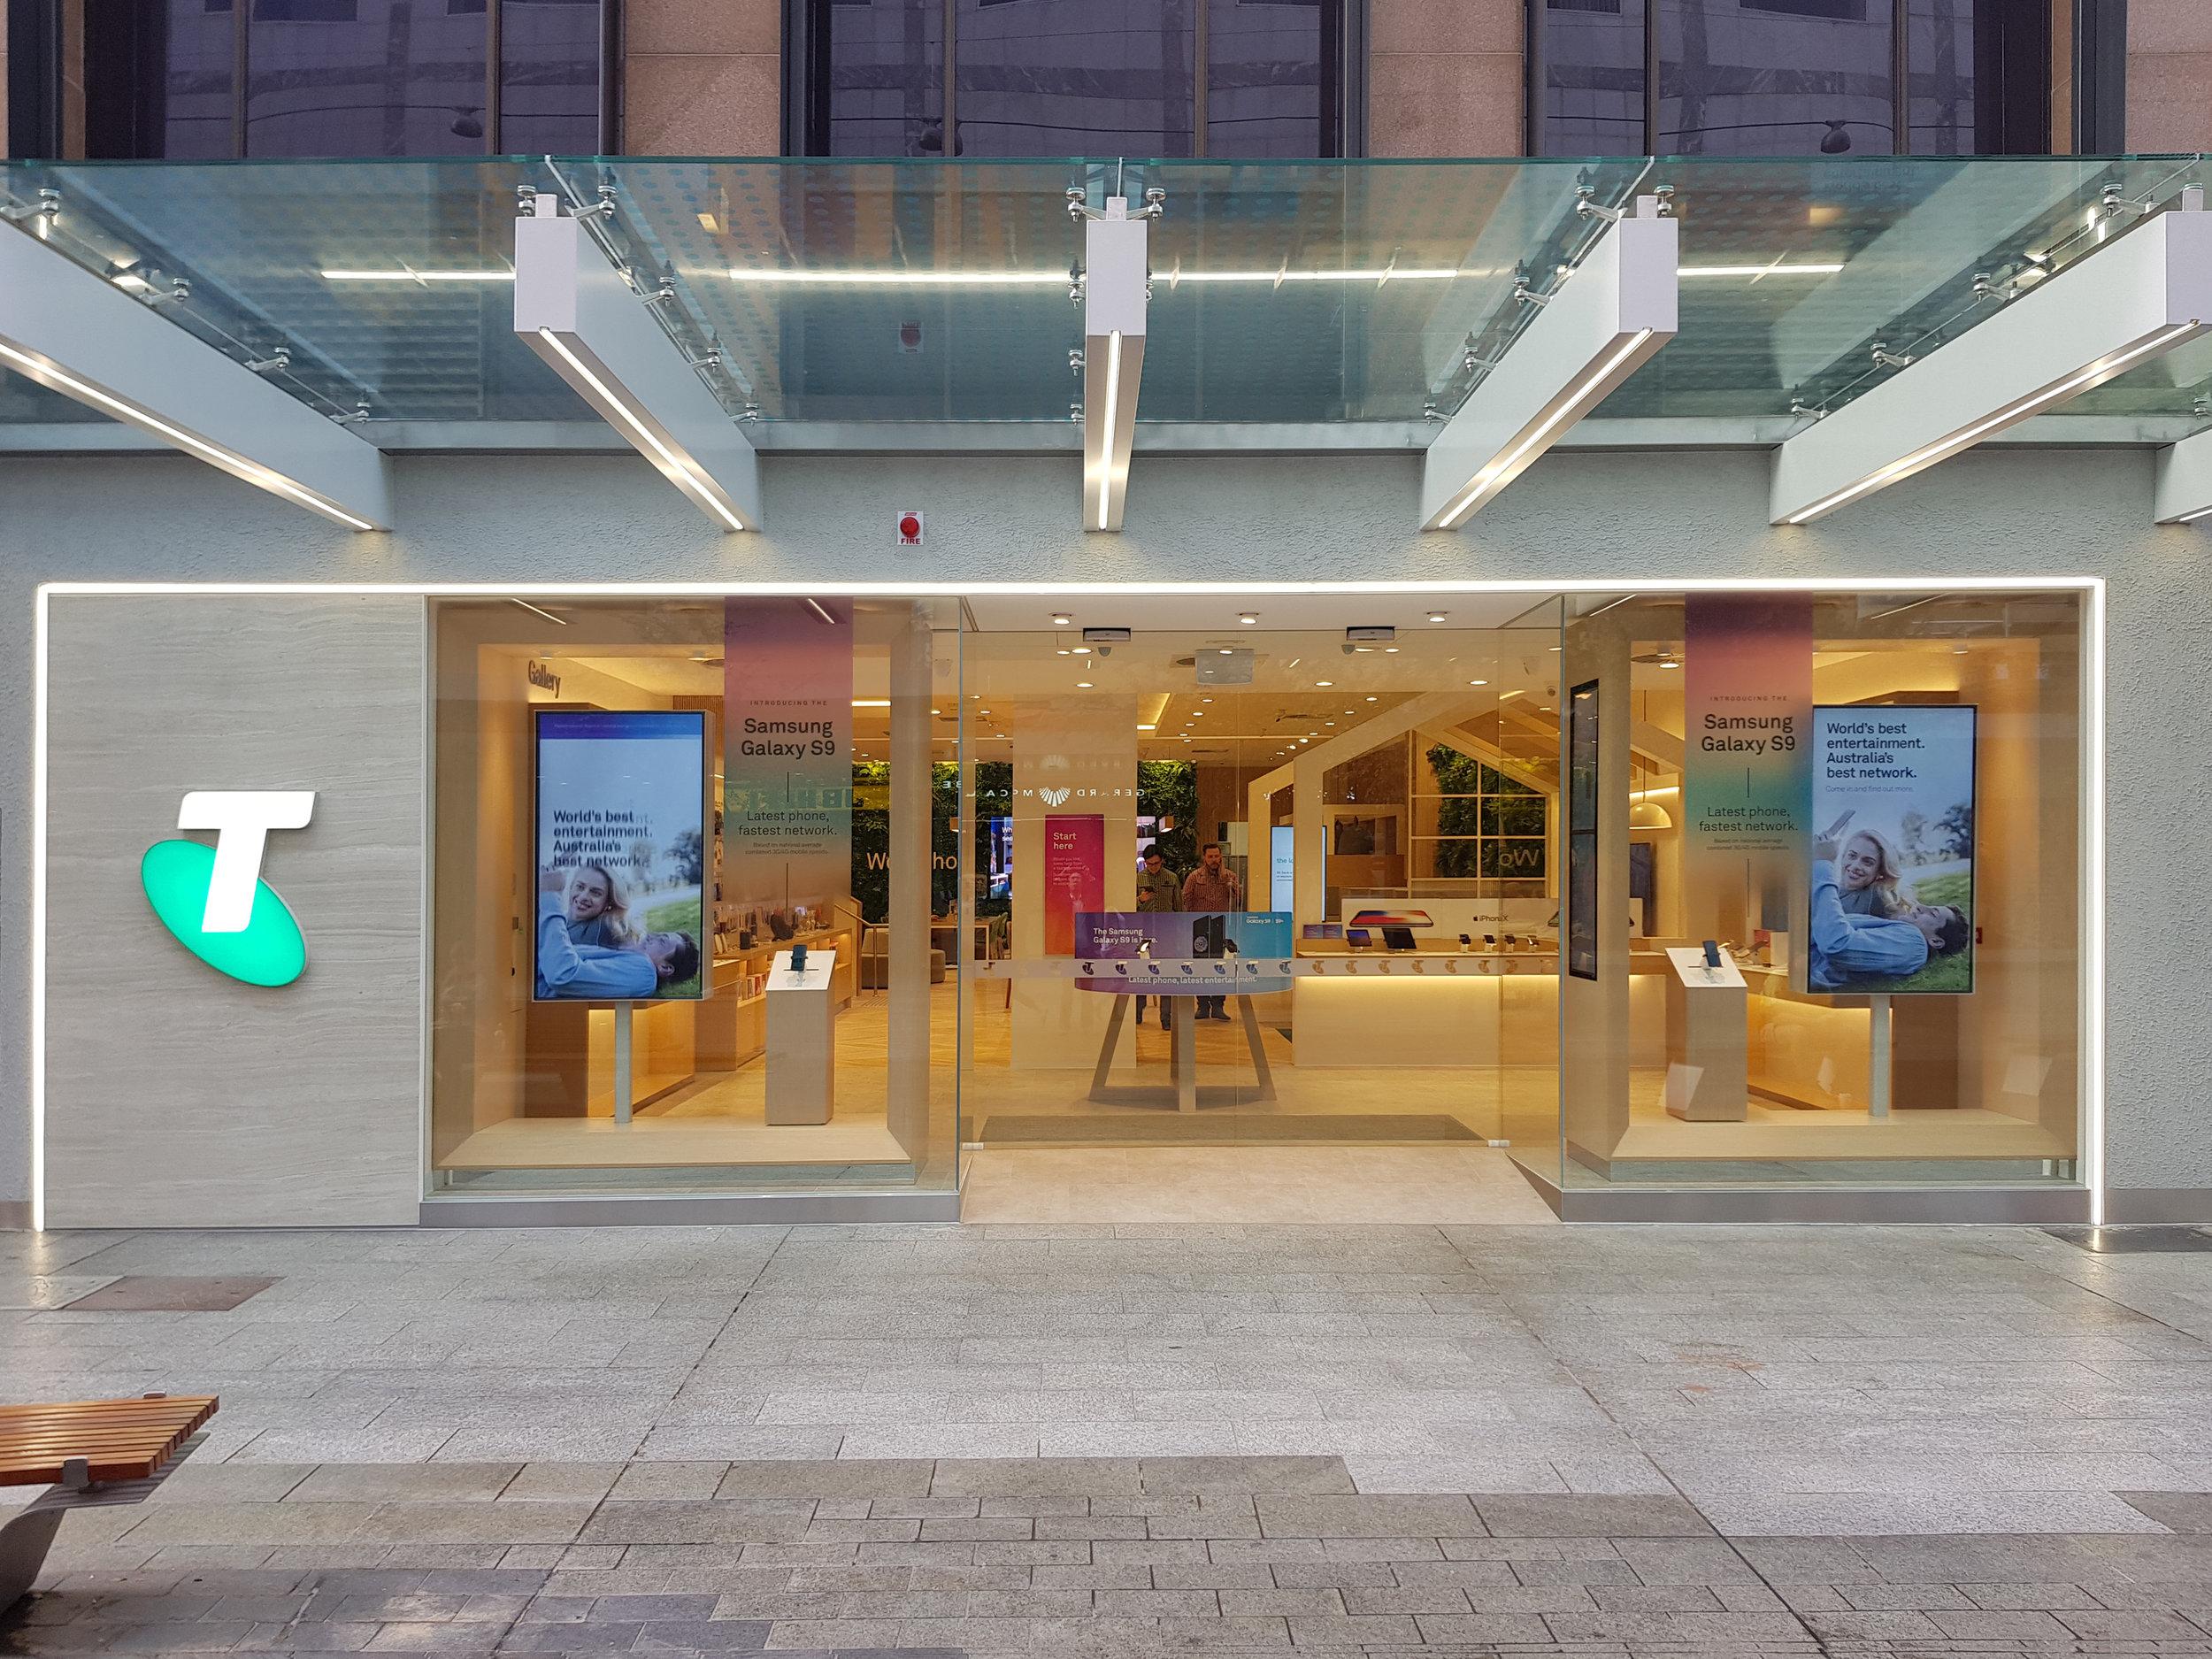 180418 Store Opening Pics - Shopfront 2.jpg